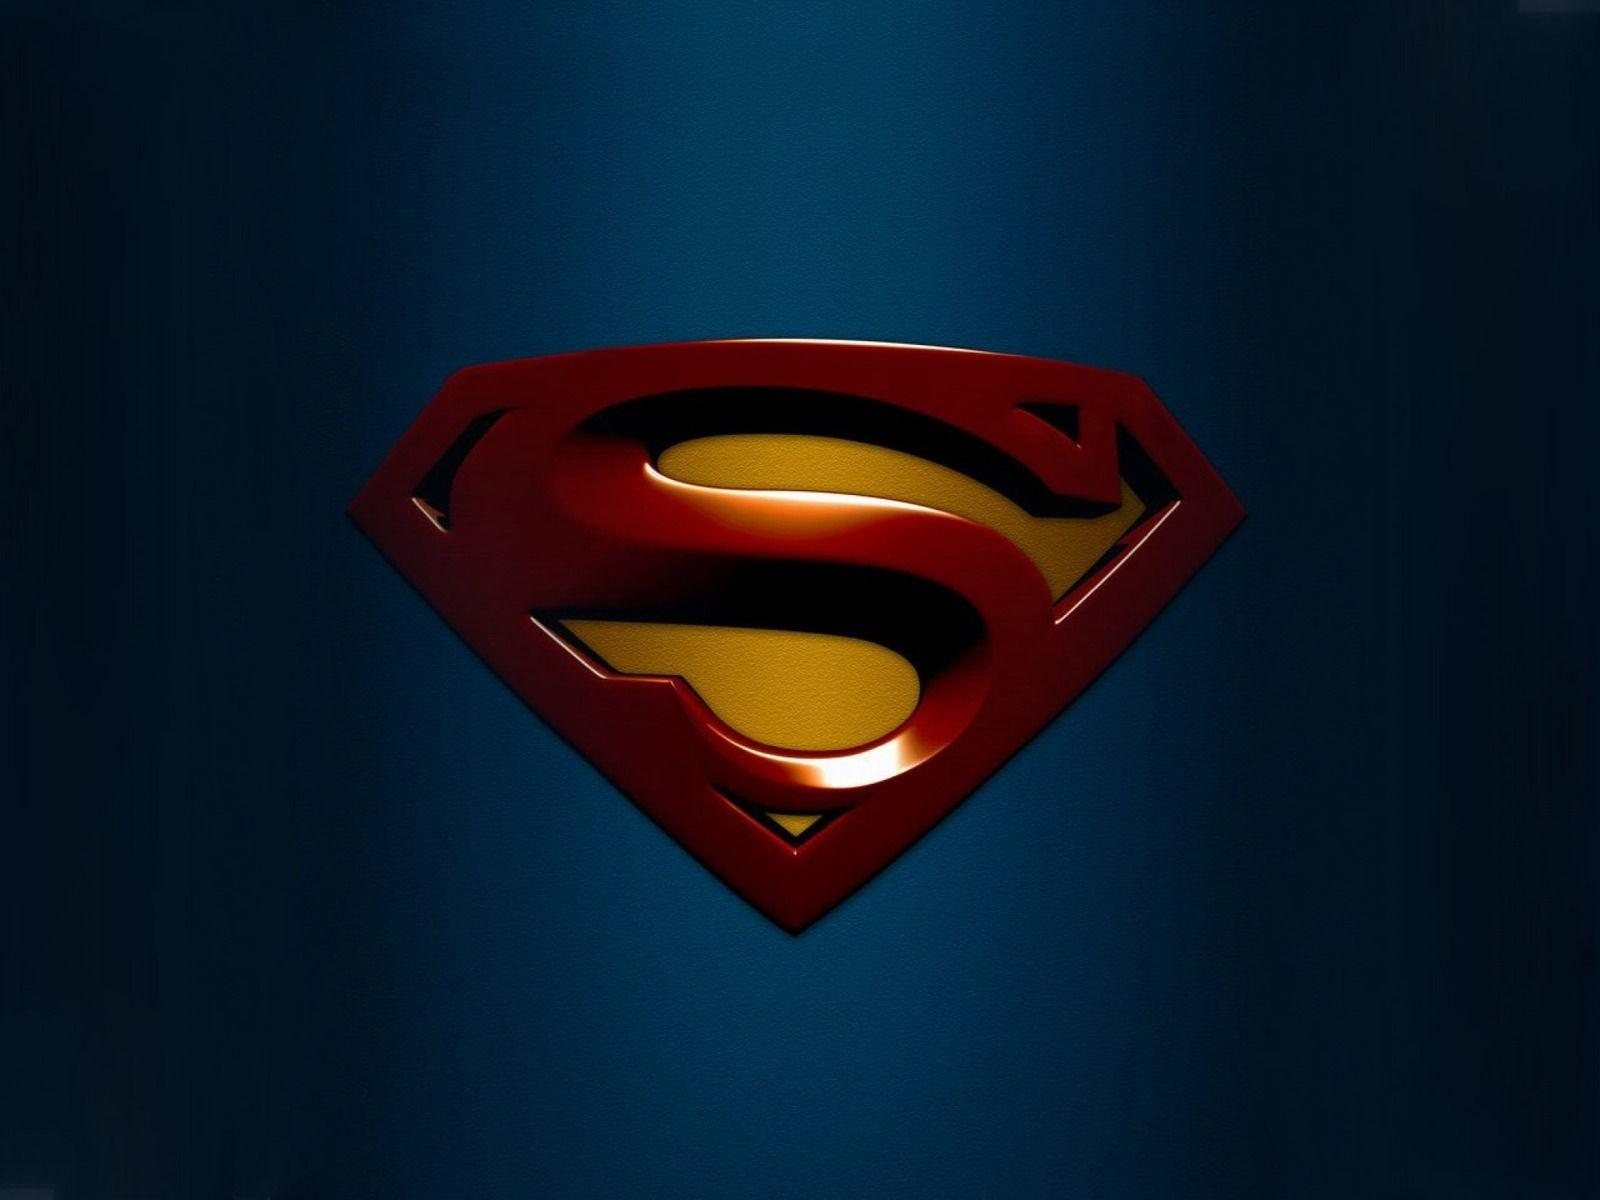 Superman Logo Wallpapers High Quality - Wickedsa com